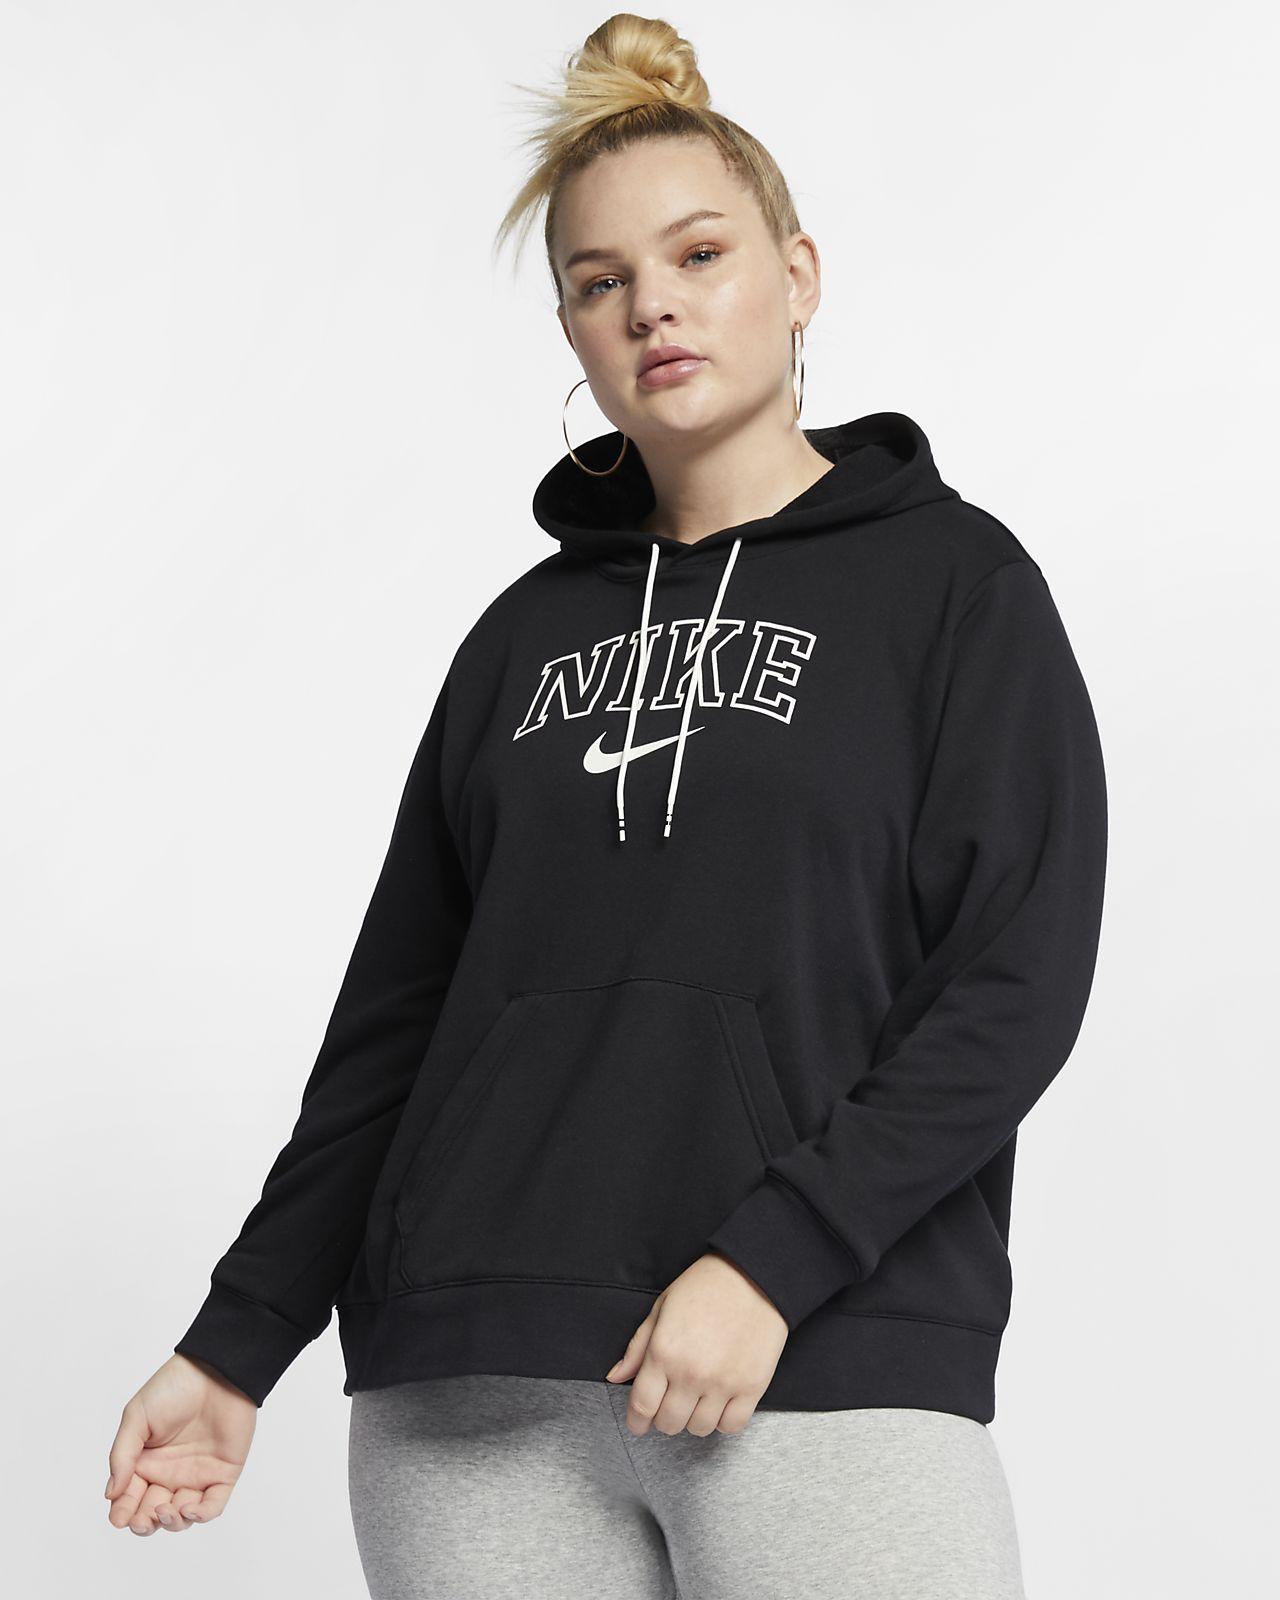 7002480ad7e5 Nike Sportswear Women s Hoodie (Plus Size). Nike.com